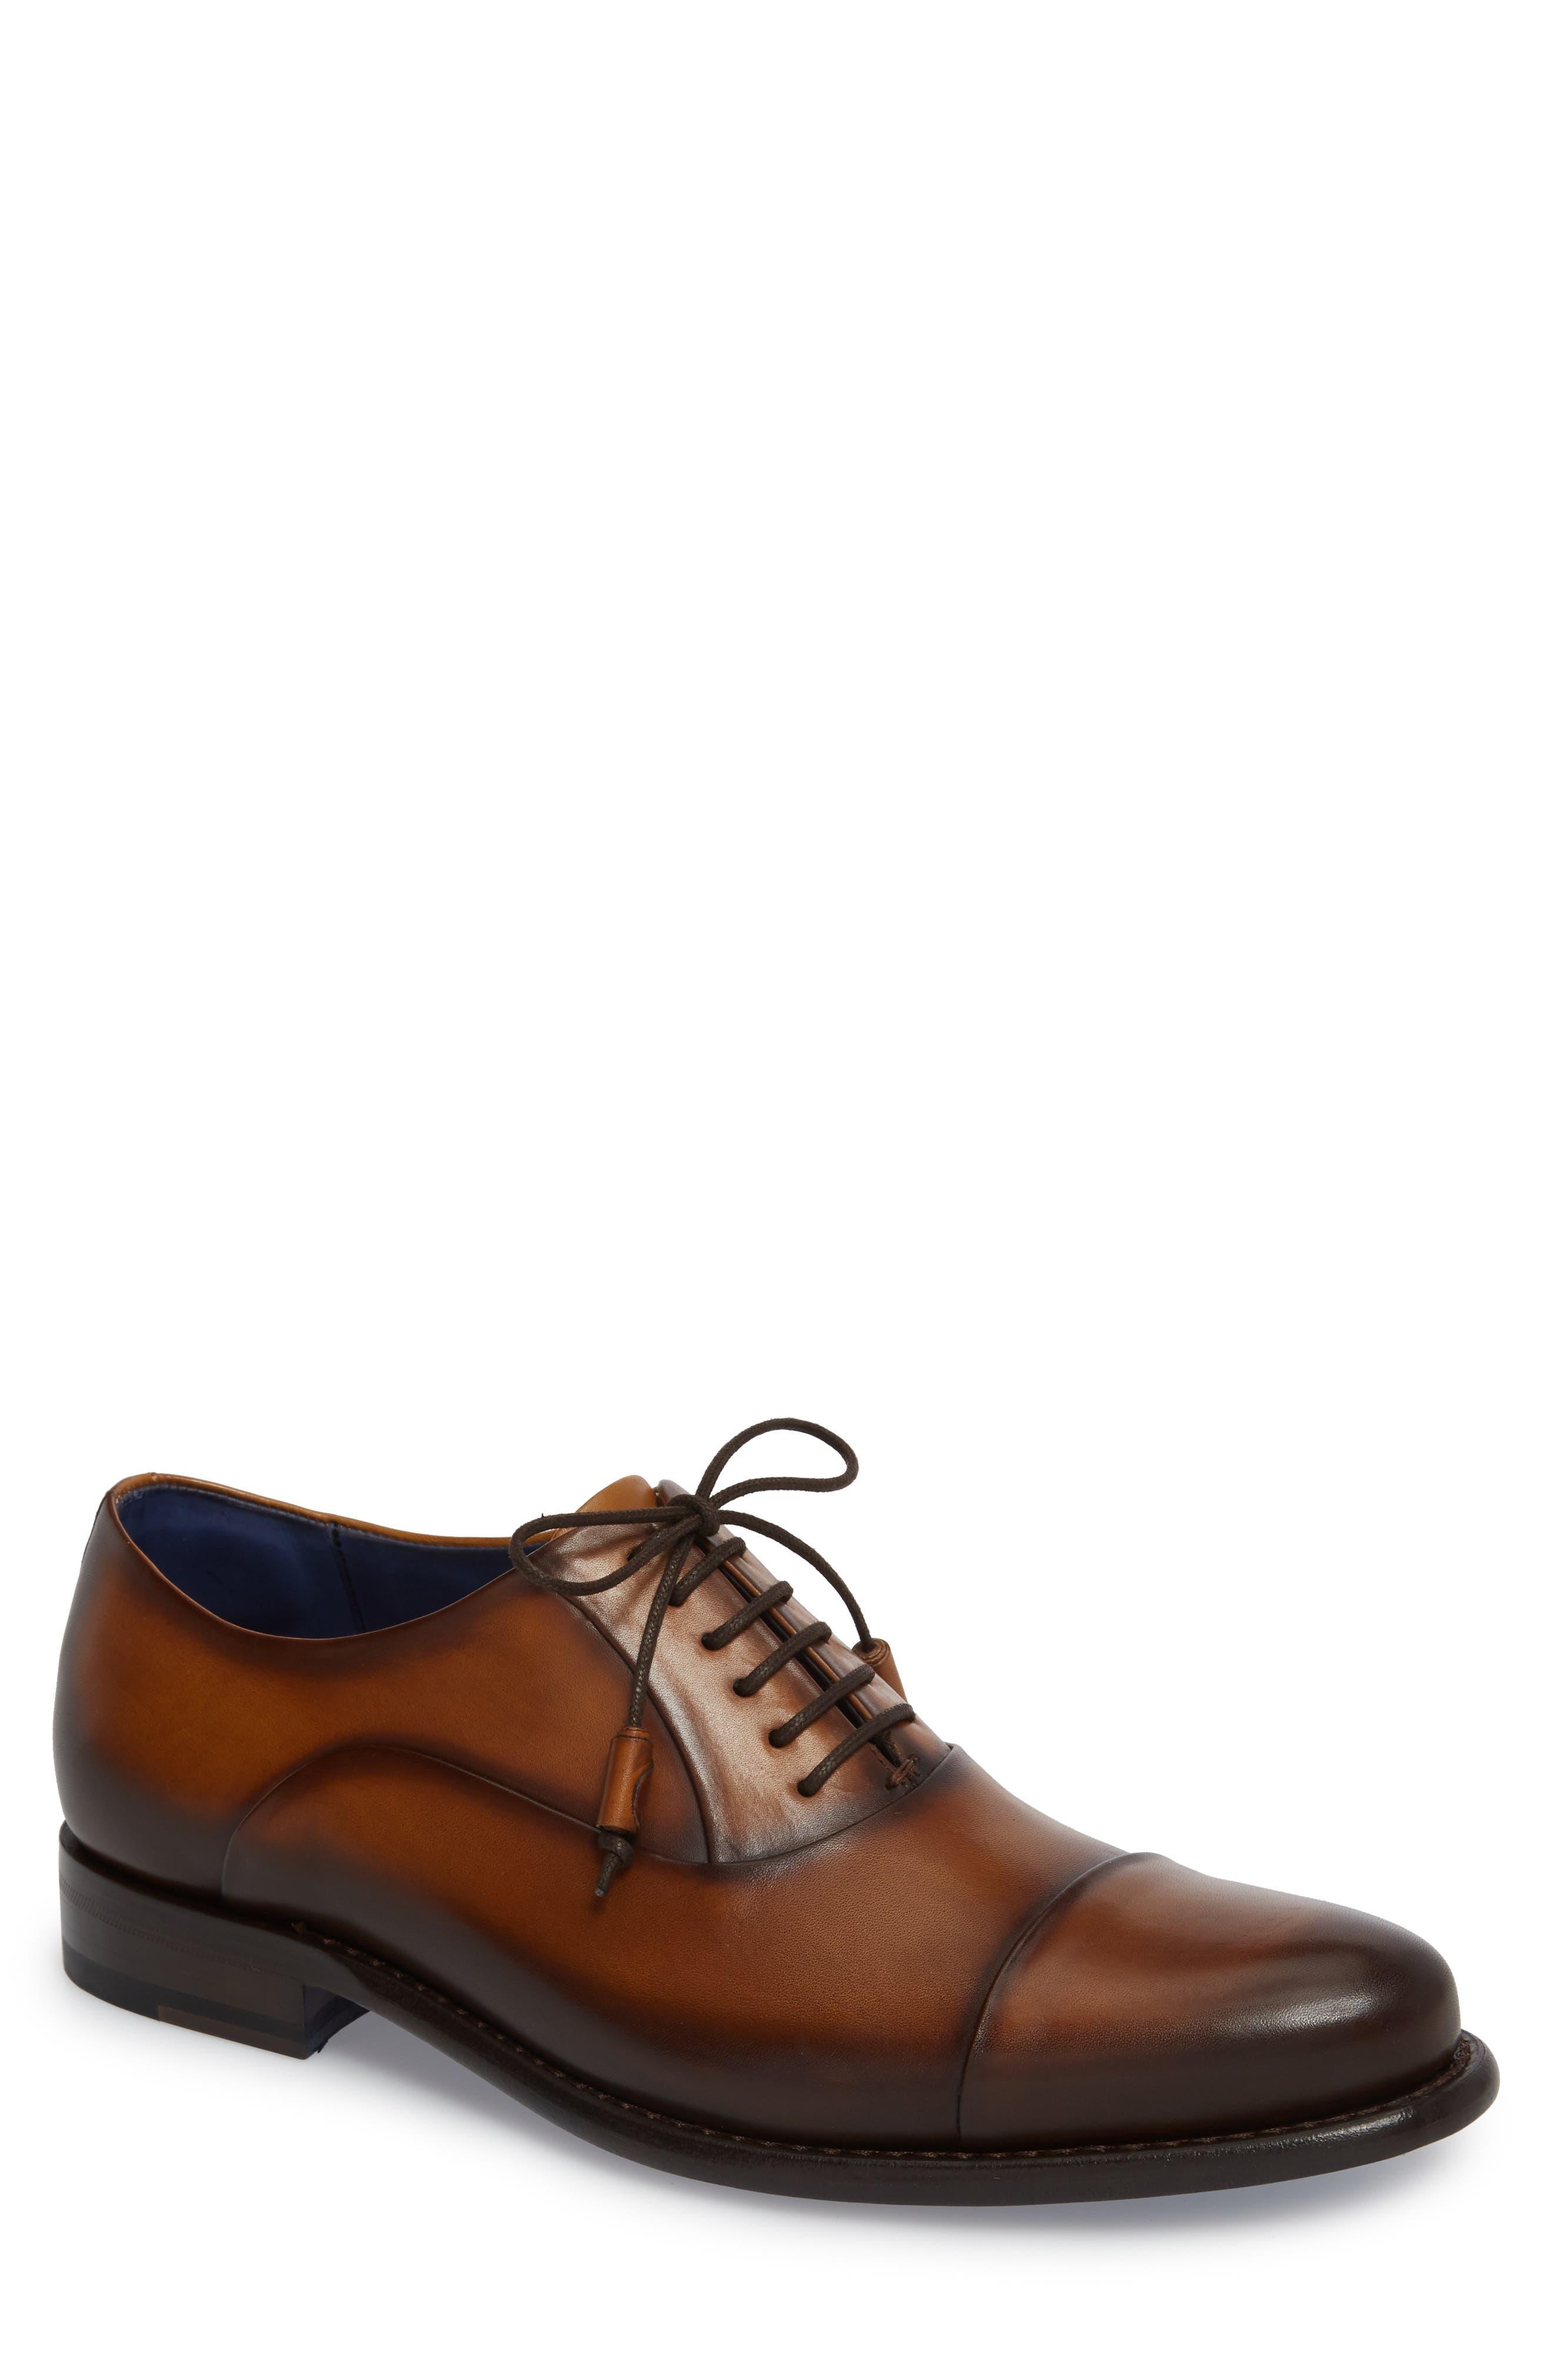 Helios Cap Toe Oxford,                         Main,                         color, Honey Leather